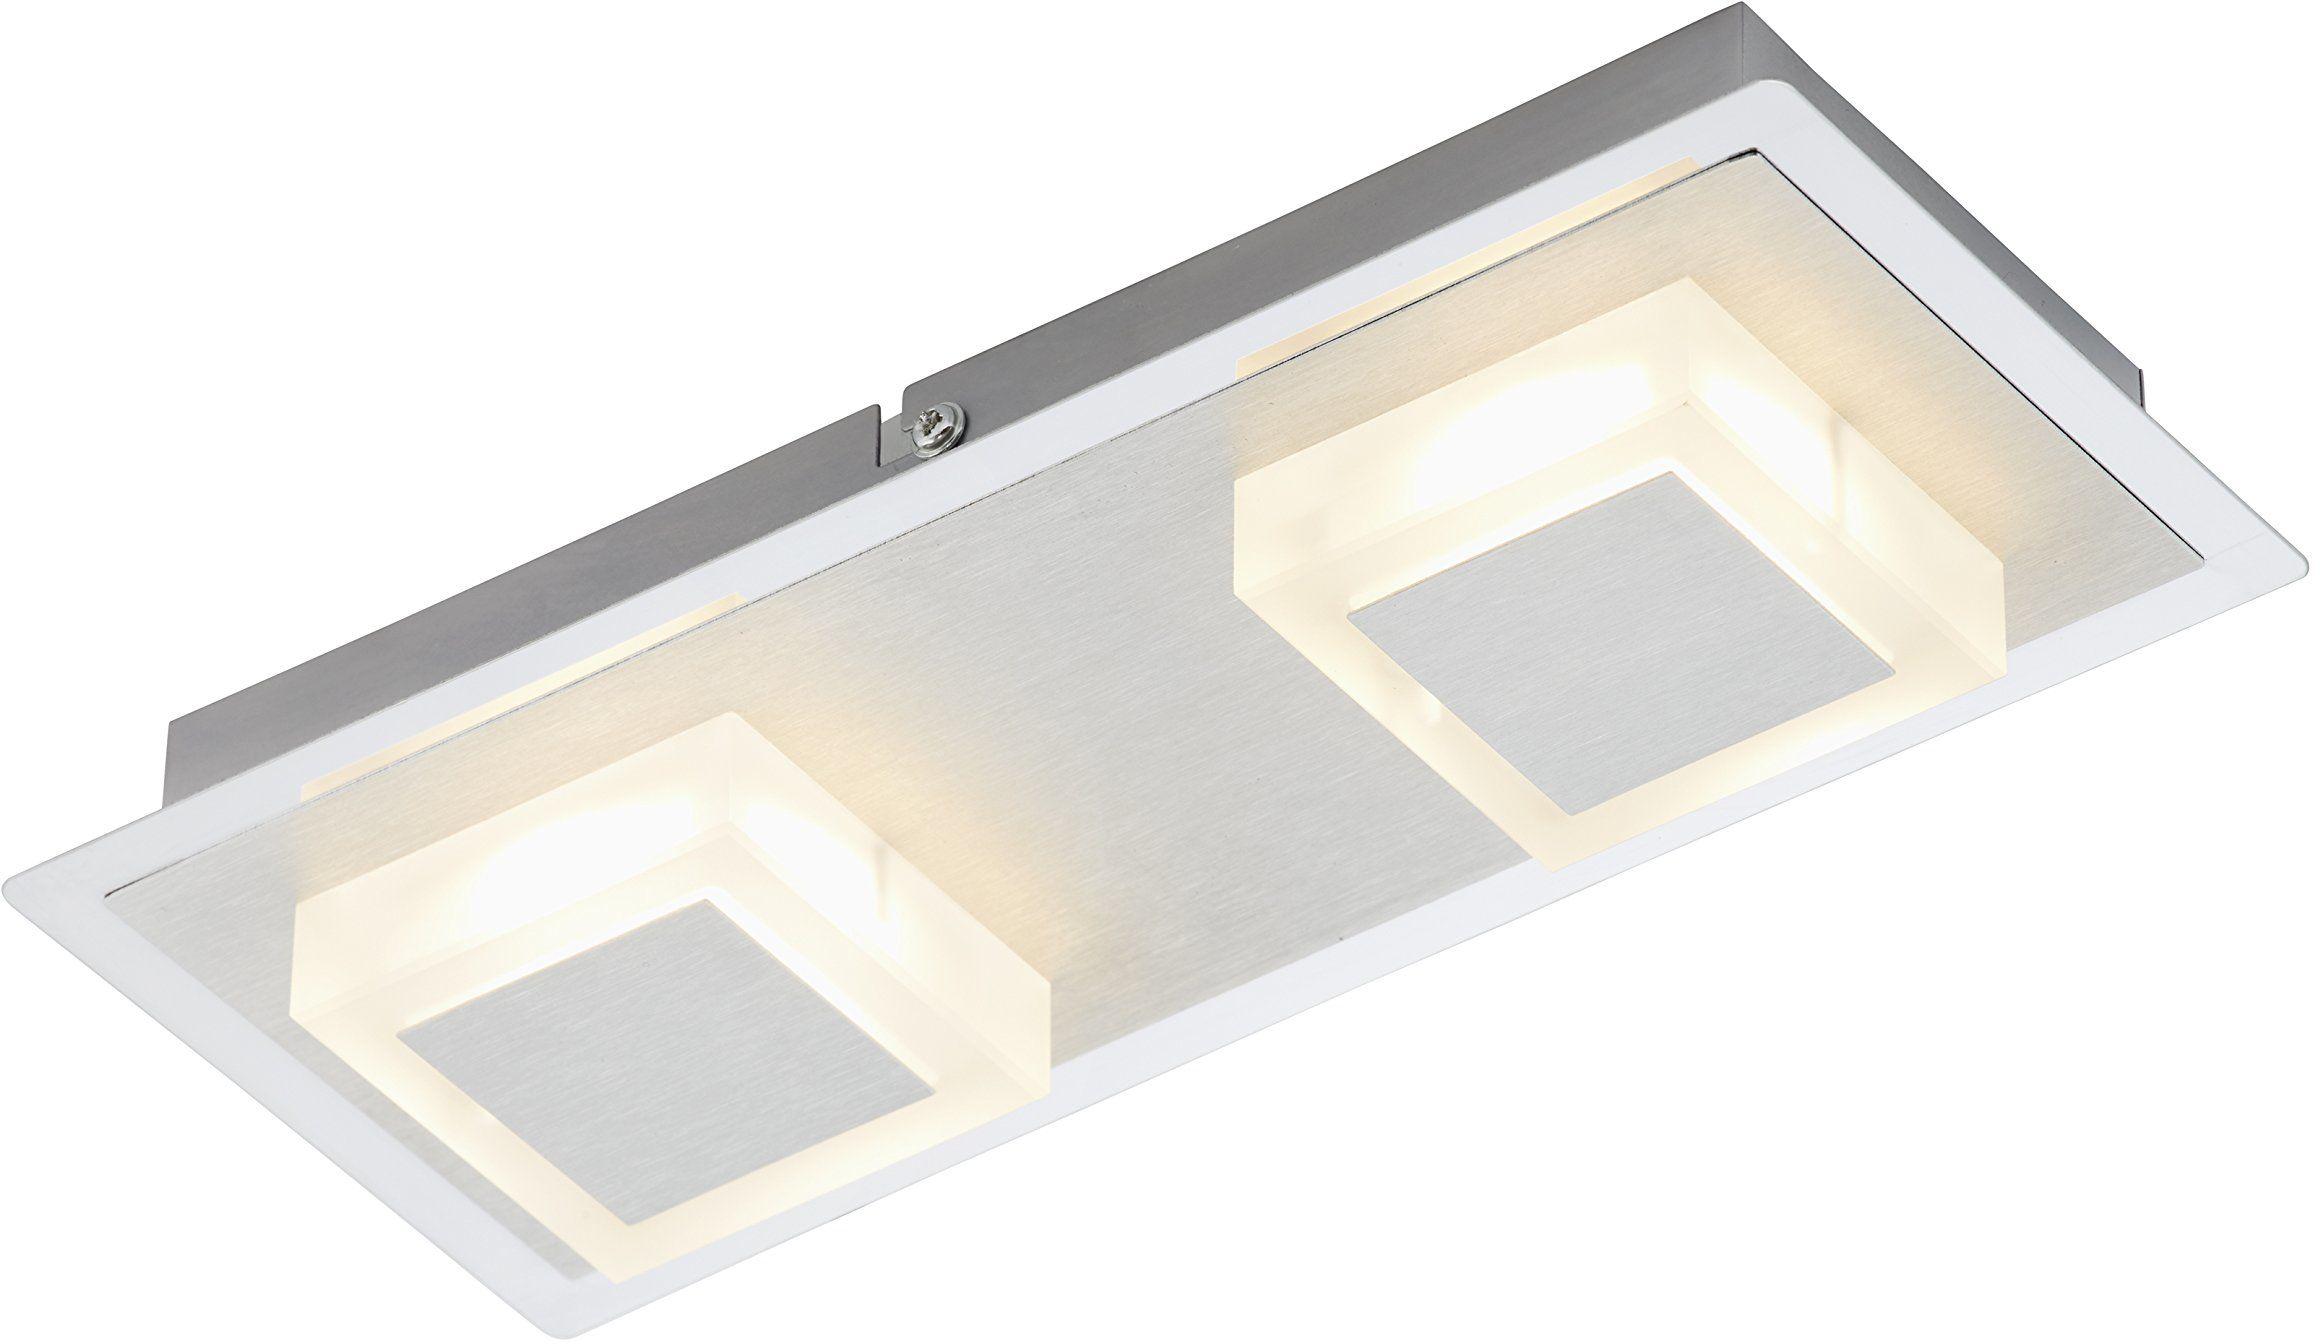 Briloner Leuchten Lampa sufitowa, lampa LED, lampa sufitowa, reflektor LED, lampa ścienna, lampa do salonu, lampa sufitowa, oświetlenie sufitowe